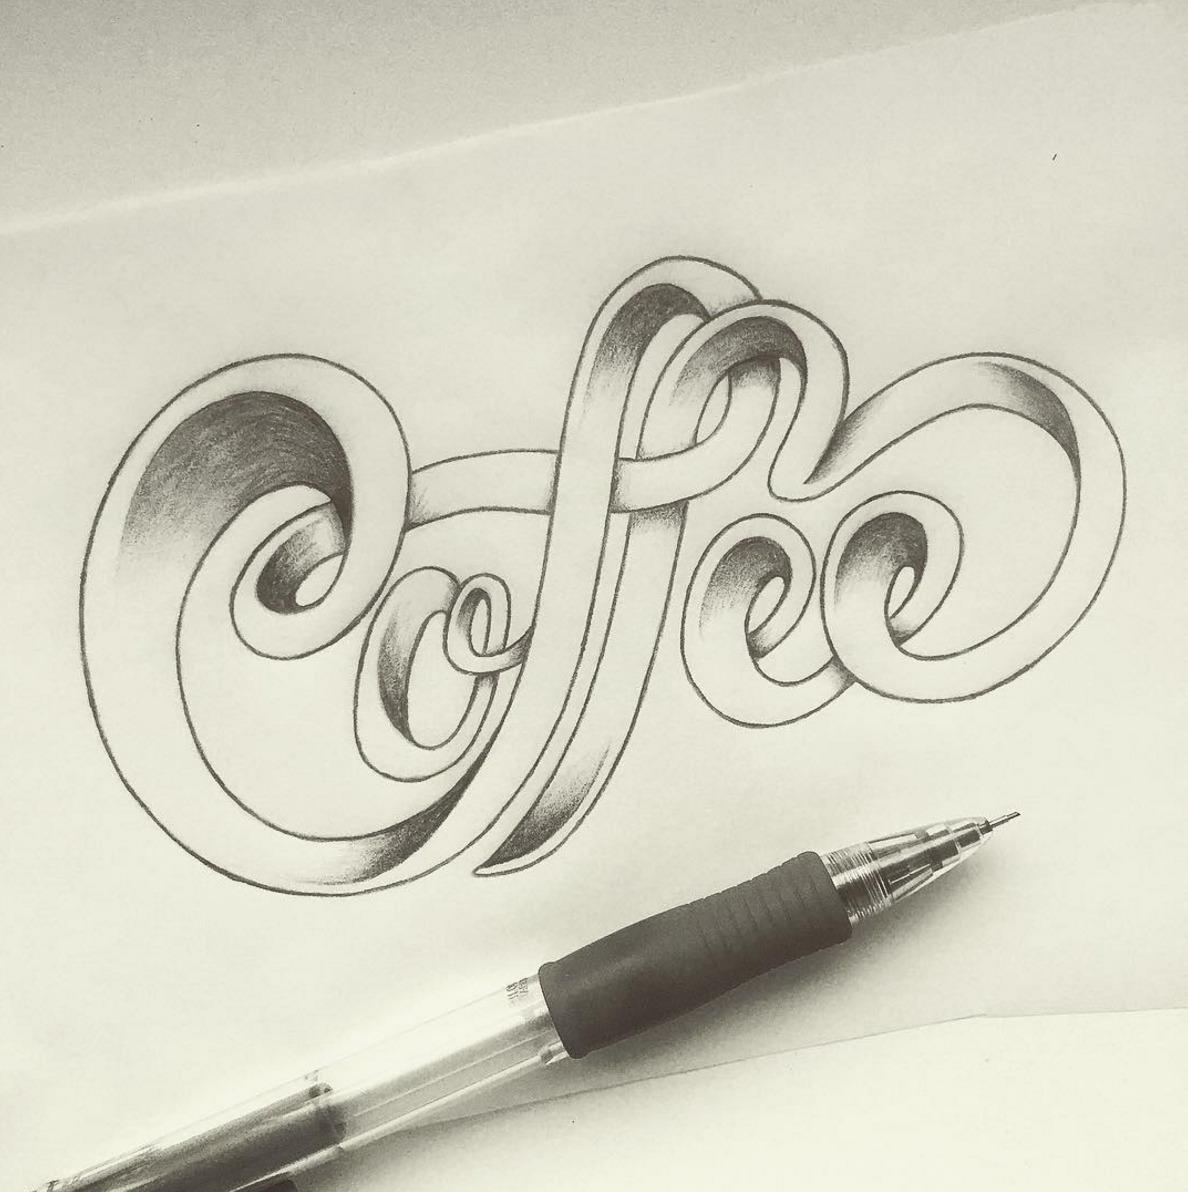 Coffee - coffee, coffeelover, drink - marketa_konta | ello